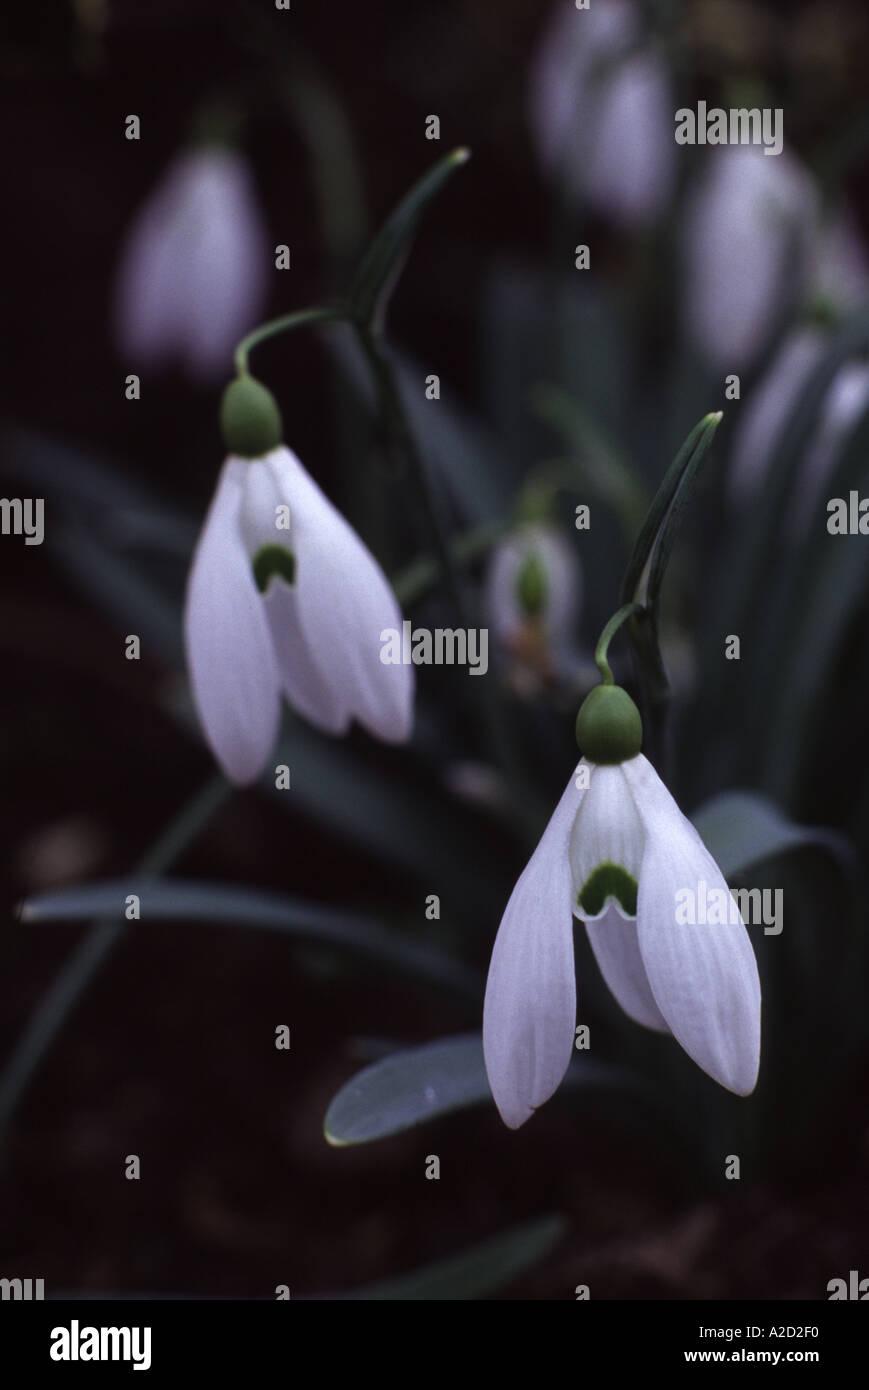 Galanthus Mighty Atom snowdrop - Stock Image